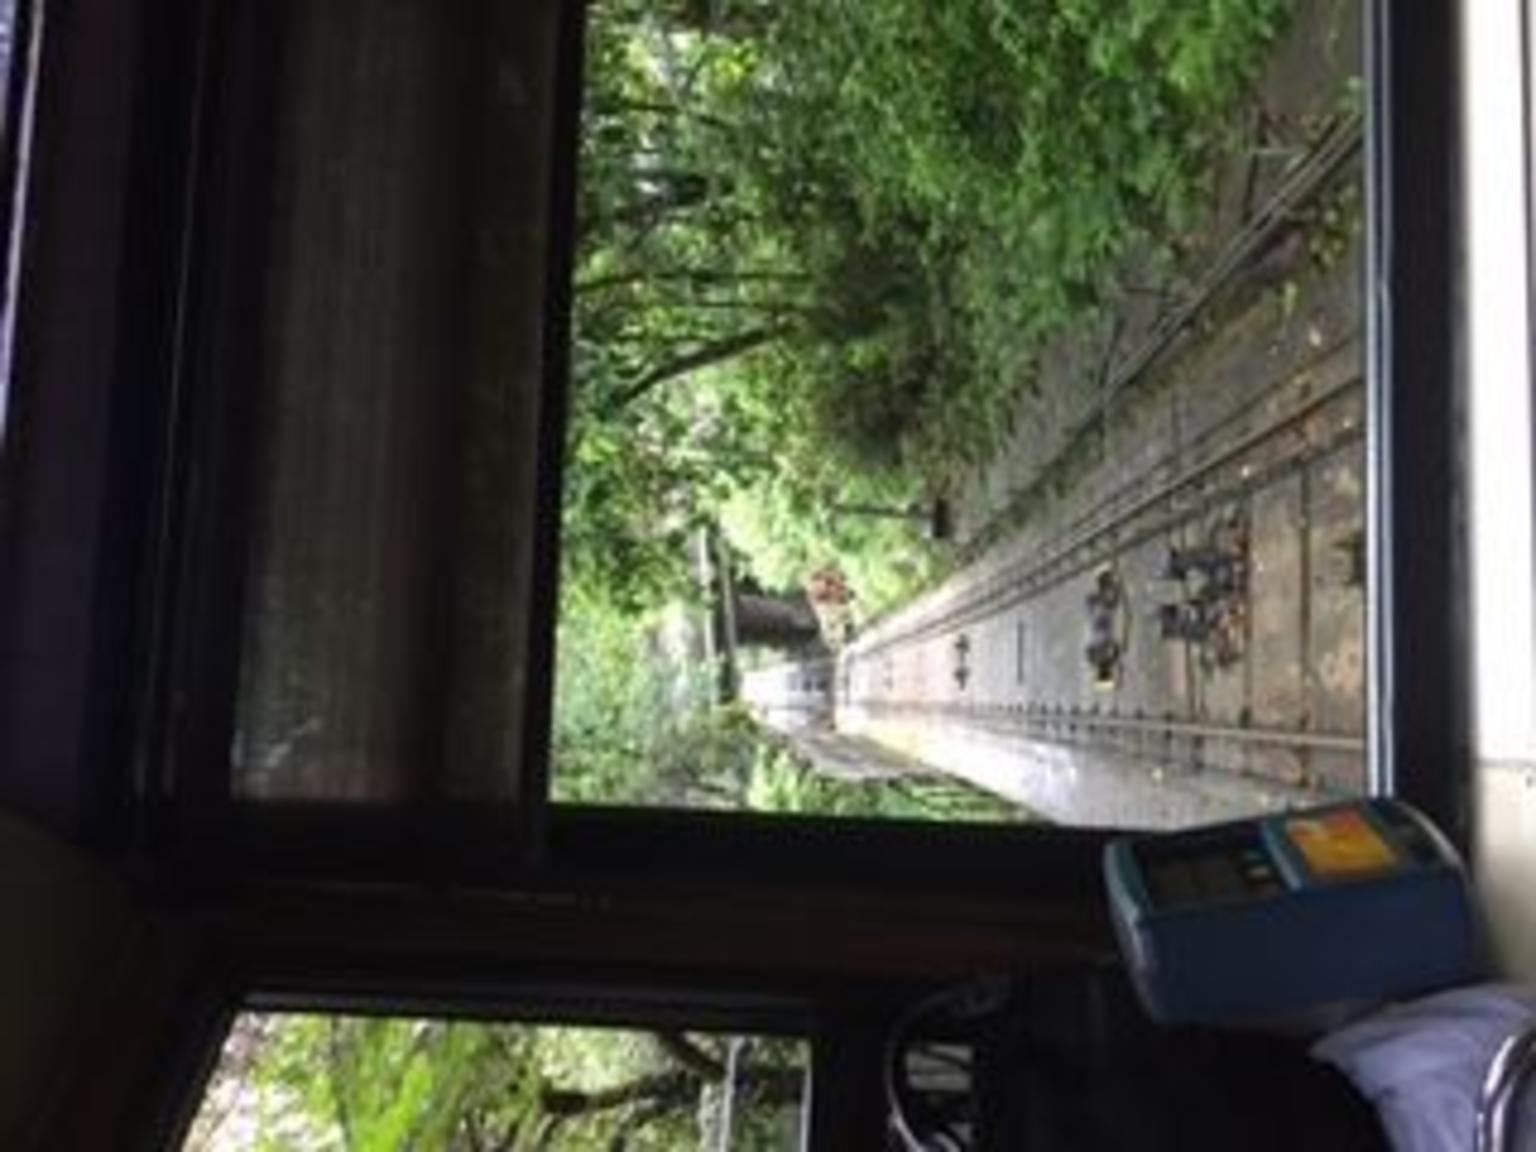 MÁS FOTOS, Hong Kong Island Half-Day Tour including Peak Tram